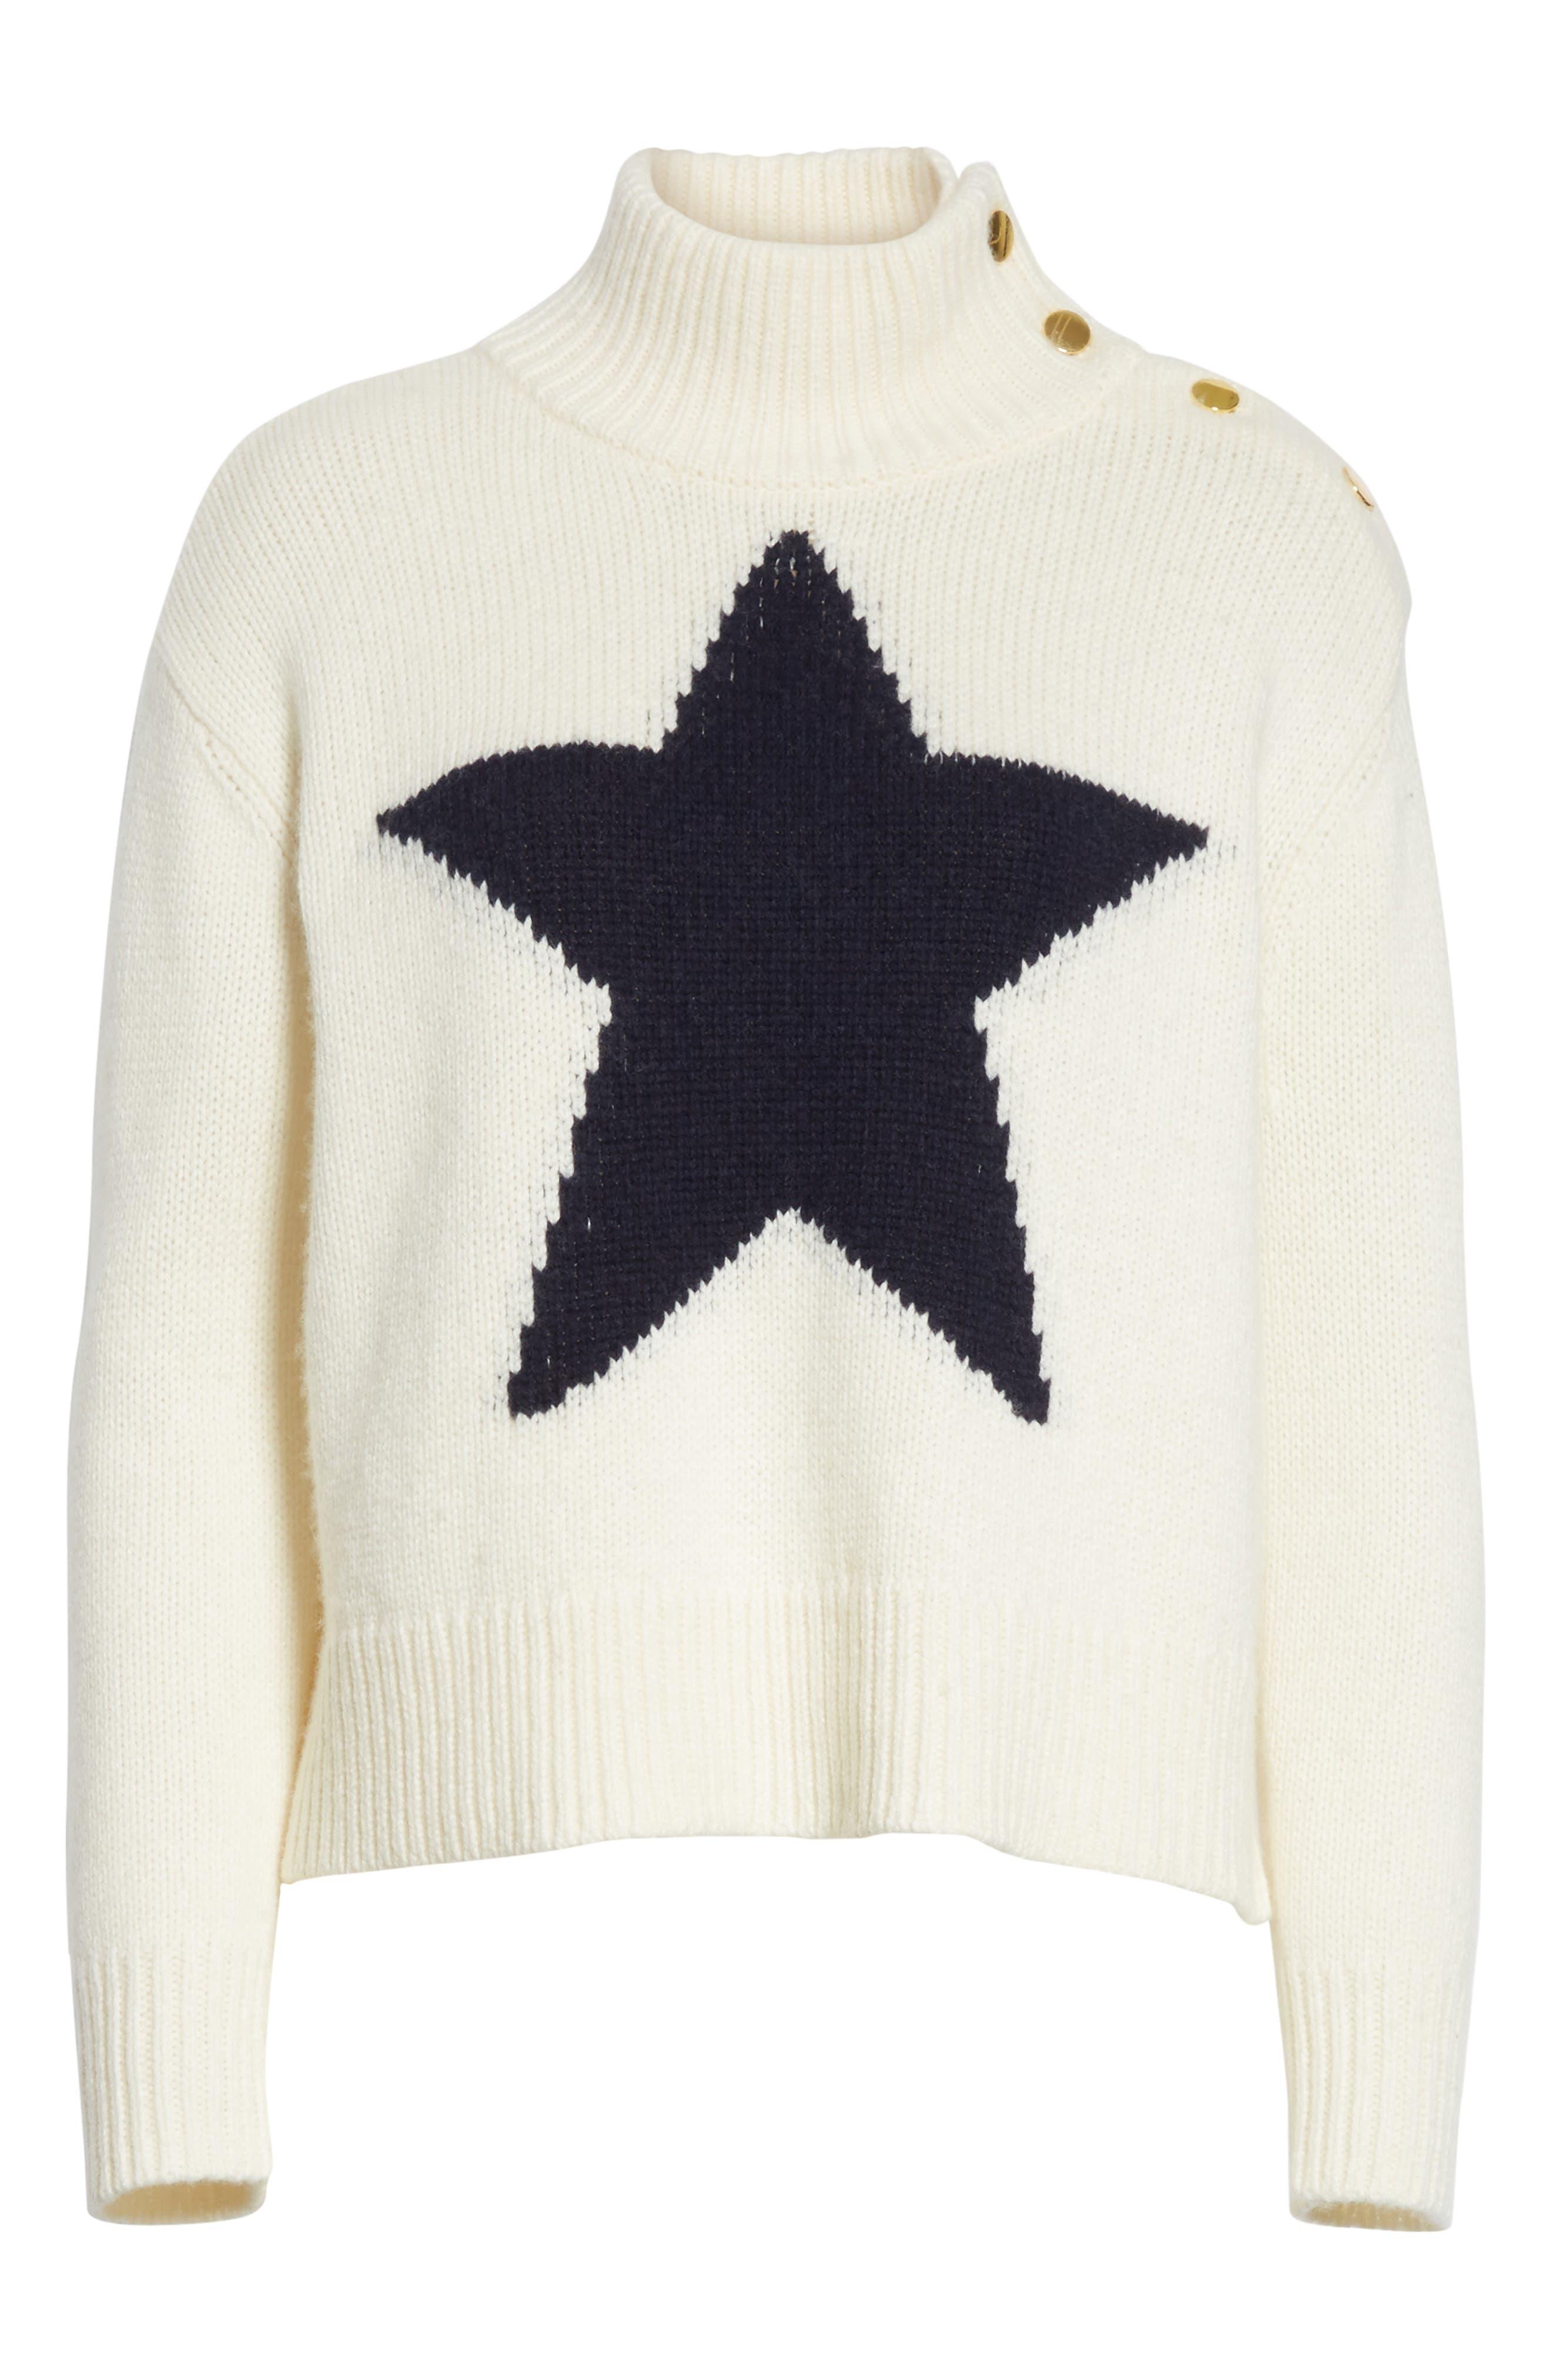 star turtleneck sweater,                             Alternate thumbnail 8, color,                             Cream/ Navy